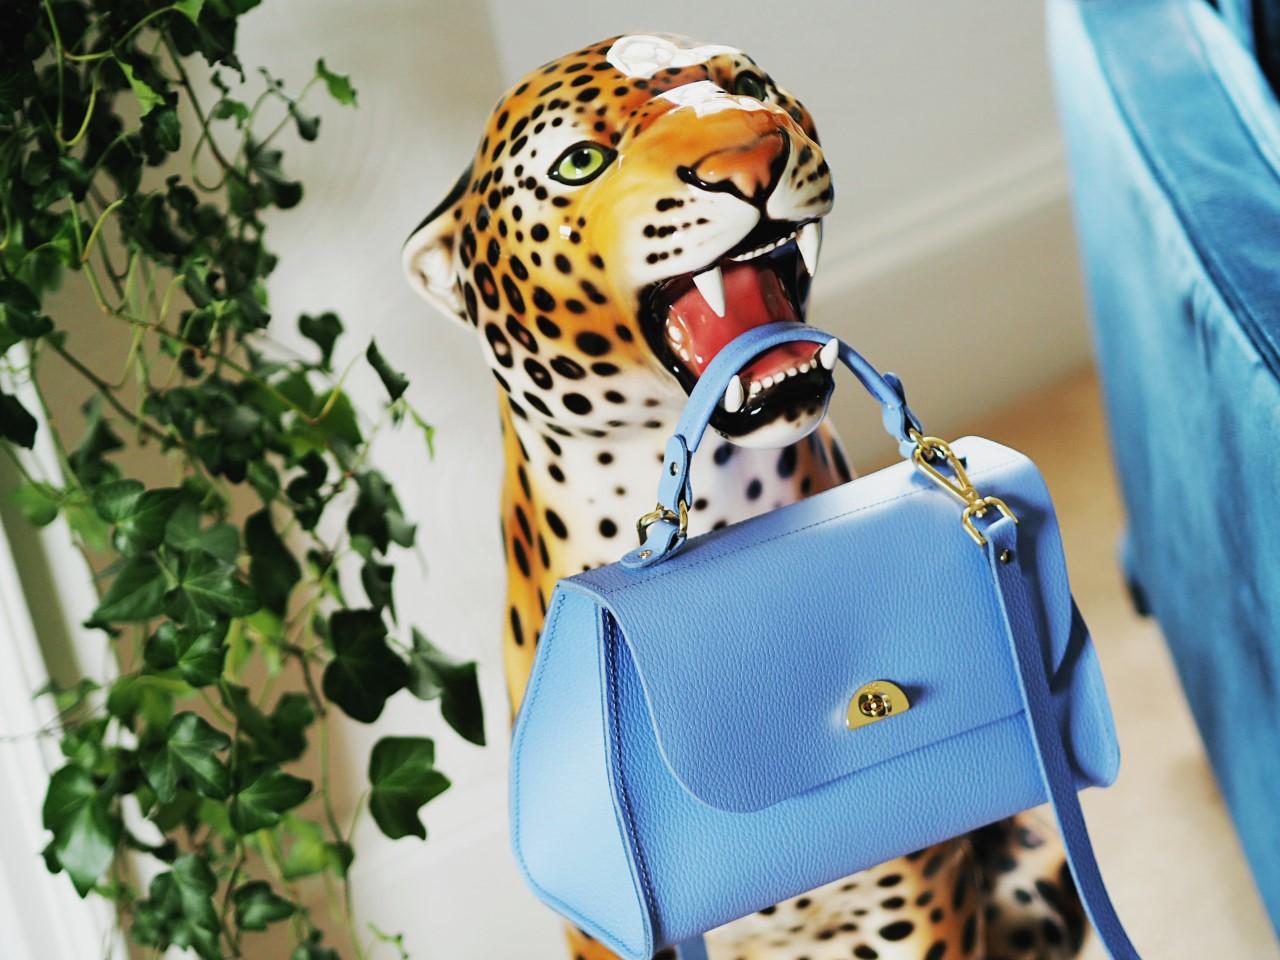 Cambridge Satchel Company Bag Review daisy poppy bellbell blue